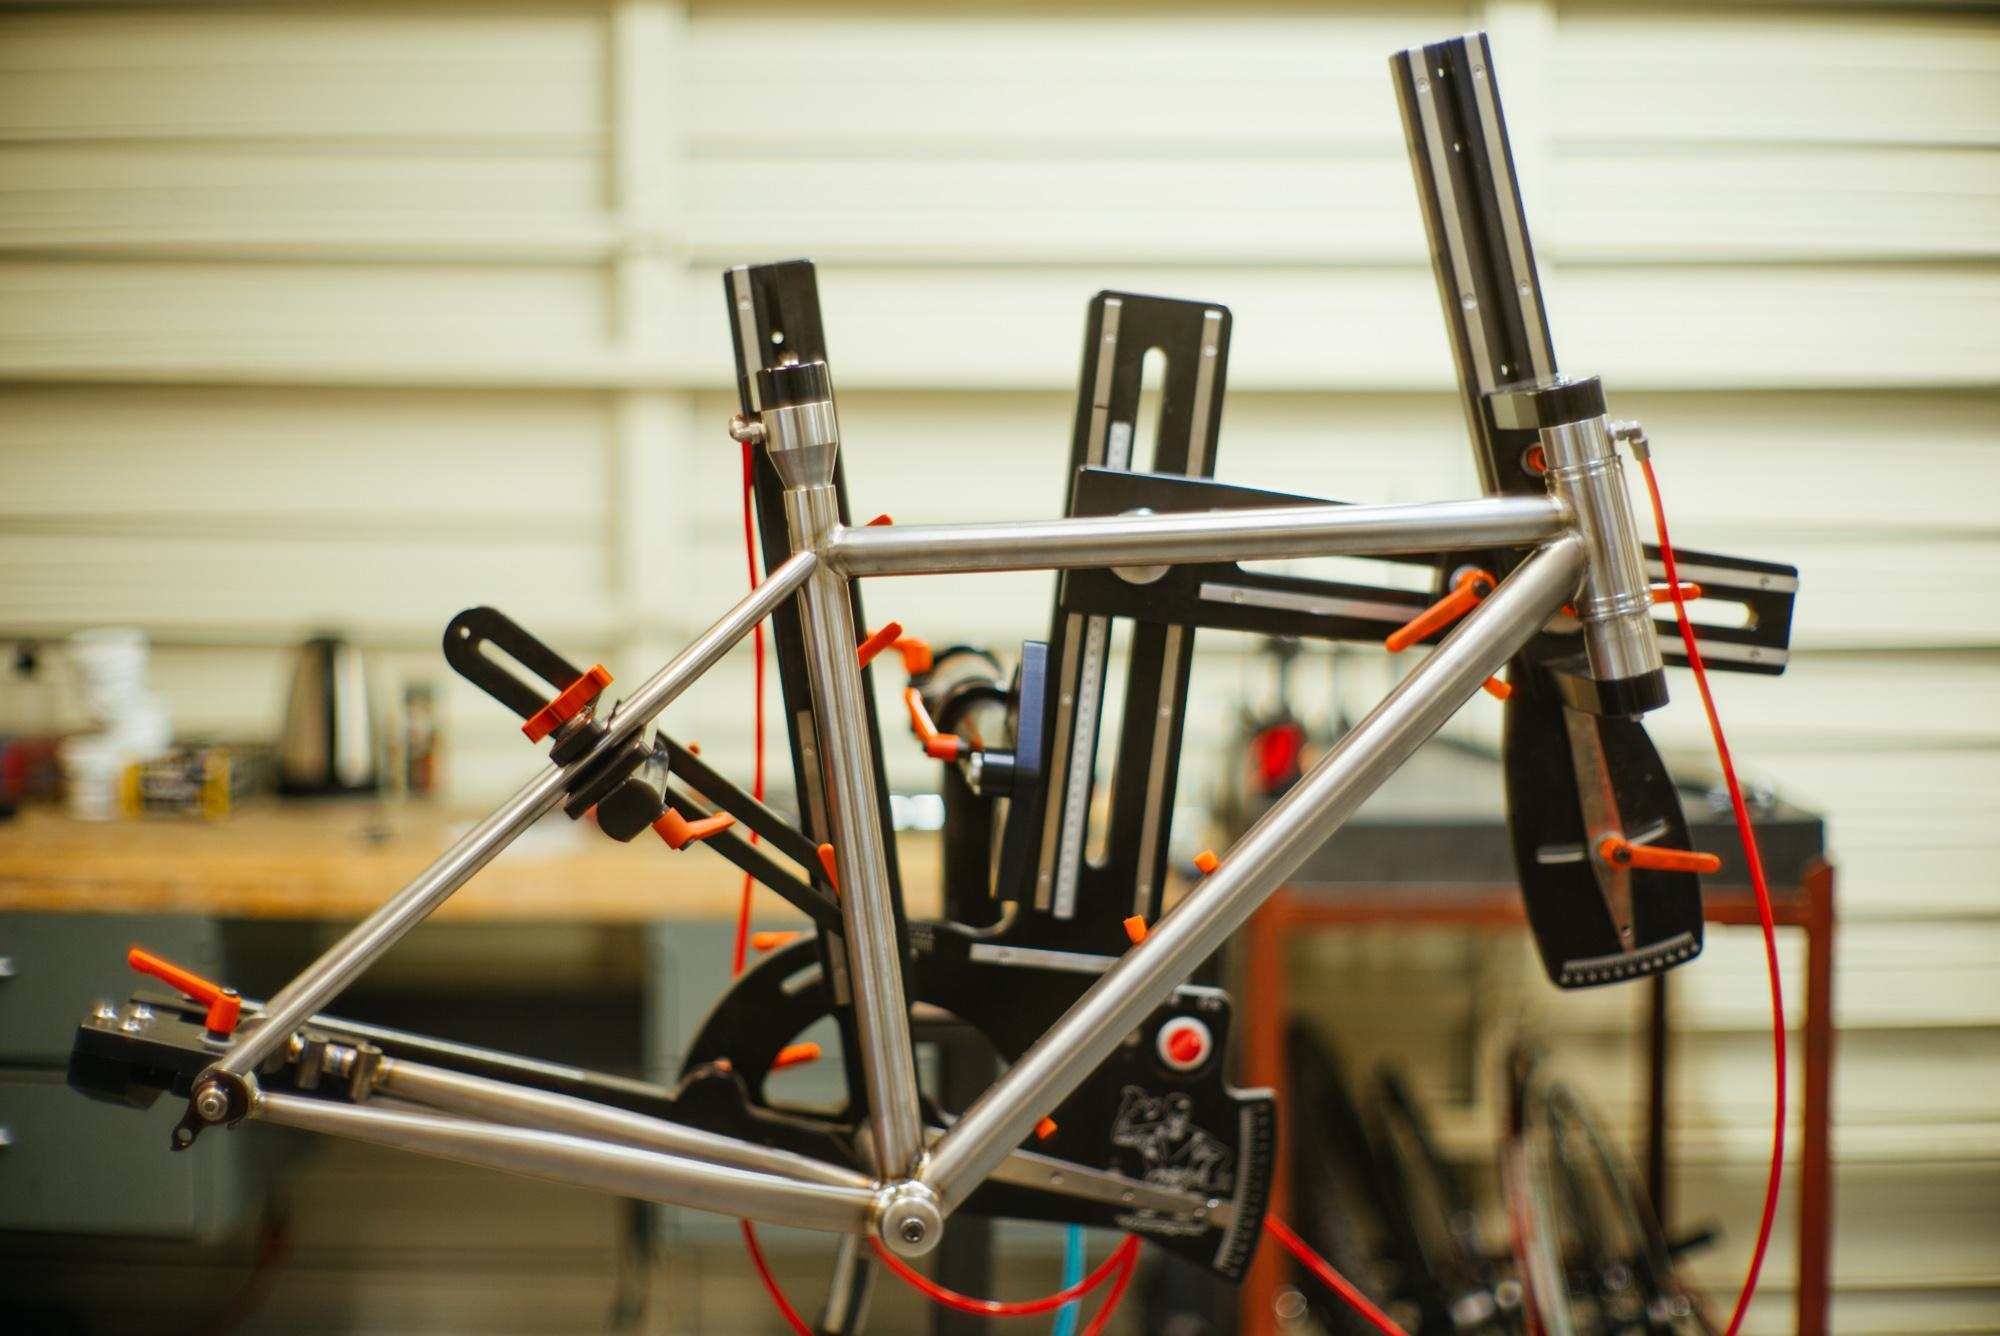 A mountain bike in the jig